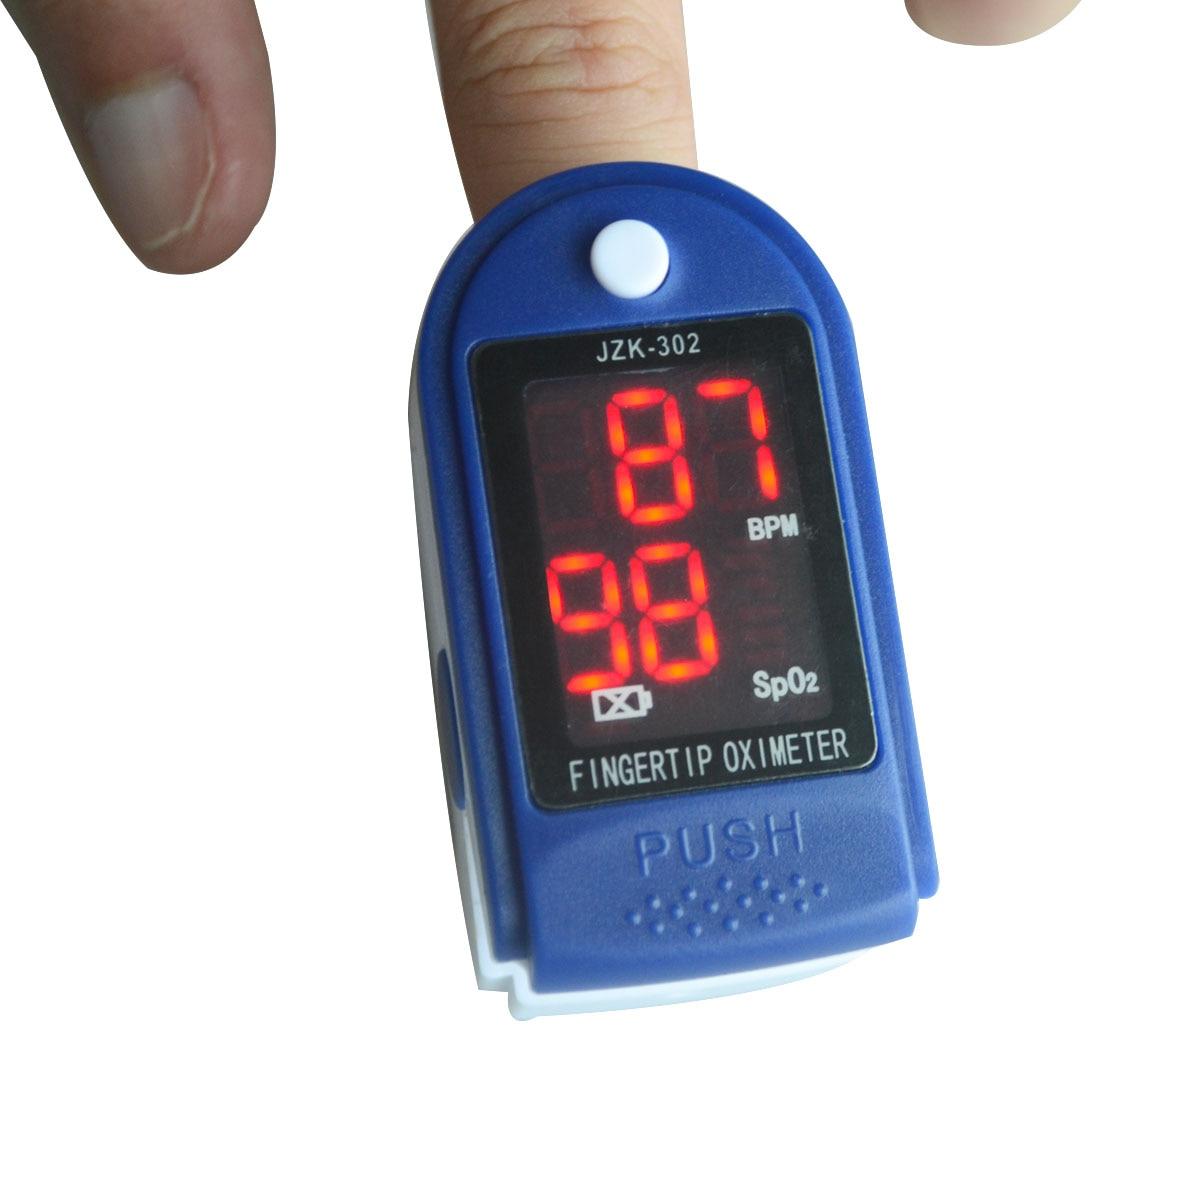 Fingertip Pulse Oximeter Diagnostic-tool Digital PR PI Heart Rate Monitor Blood Oxygen Saturation Tester Oximetro De Pulso 5Pcs oled pulse finger fingertip oximeter blood spo2 pr heart rate monitor